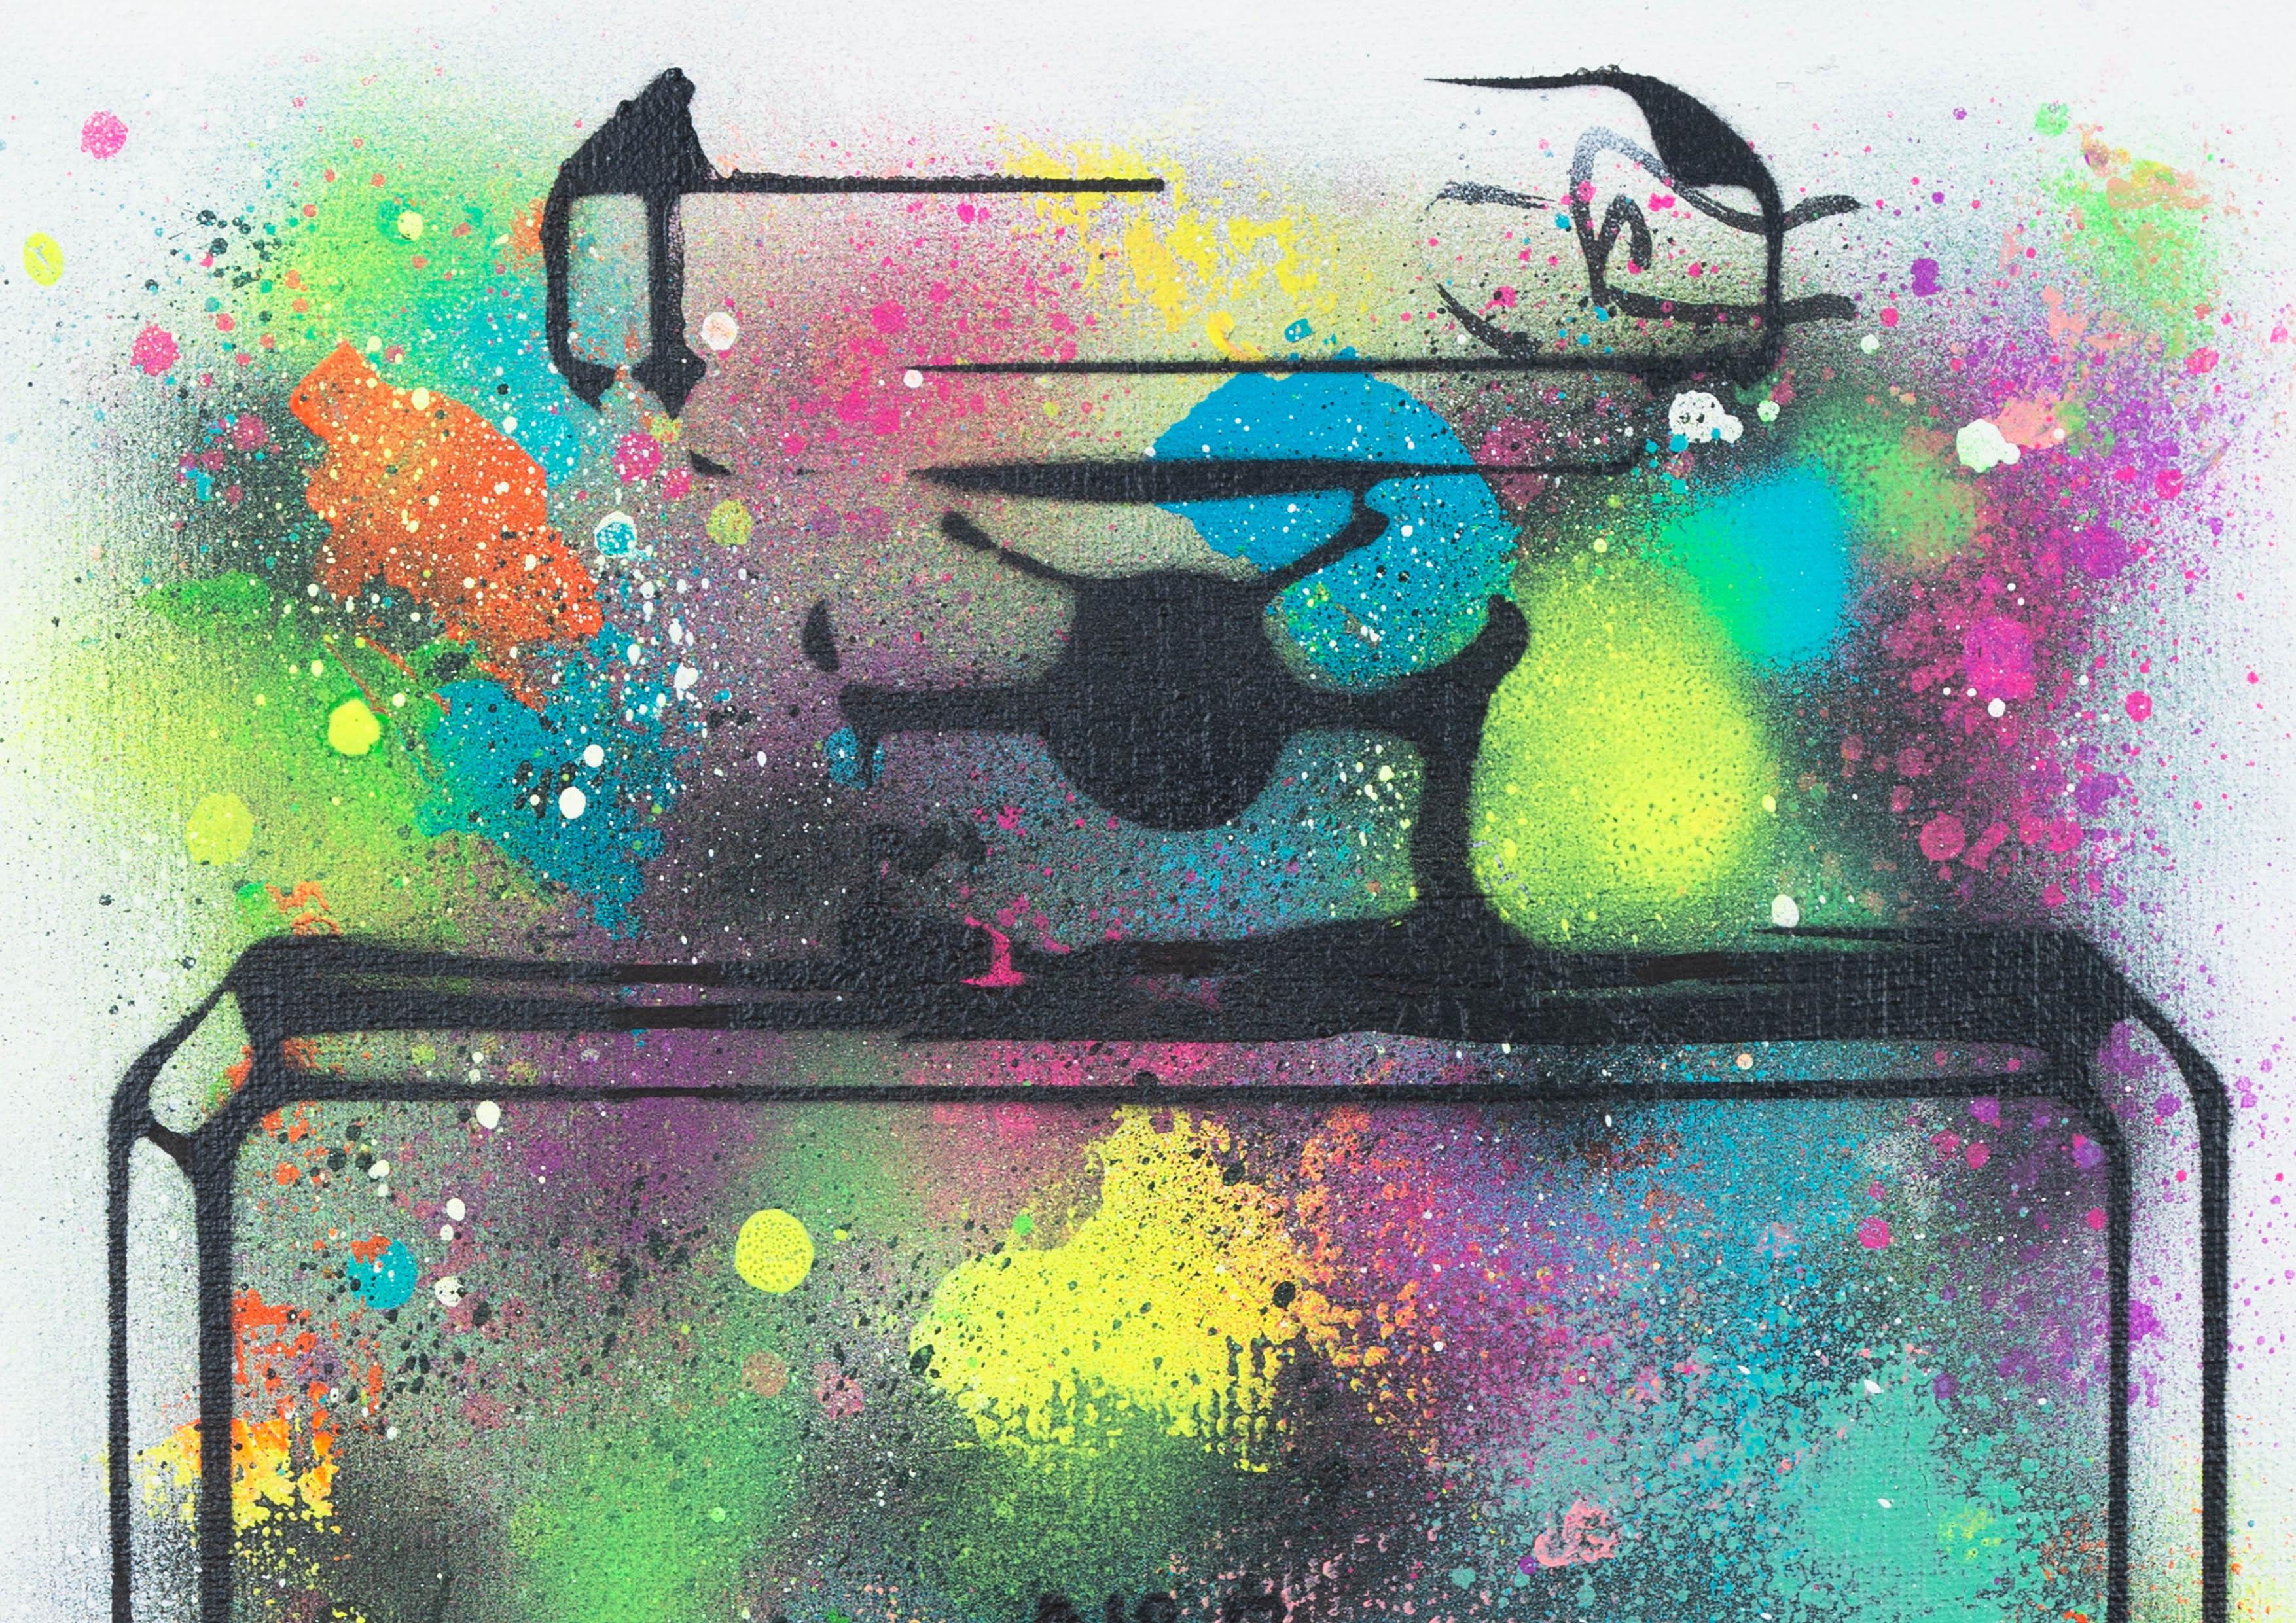 ART-PAINT-CHANEL-PERFUME-GRAFFITTI-CANVAS-DETAIL-1